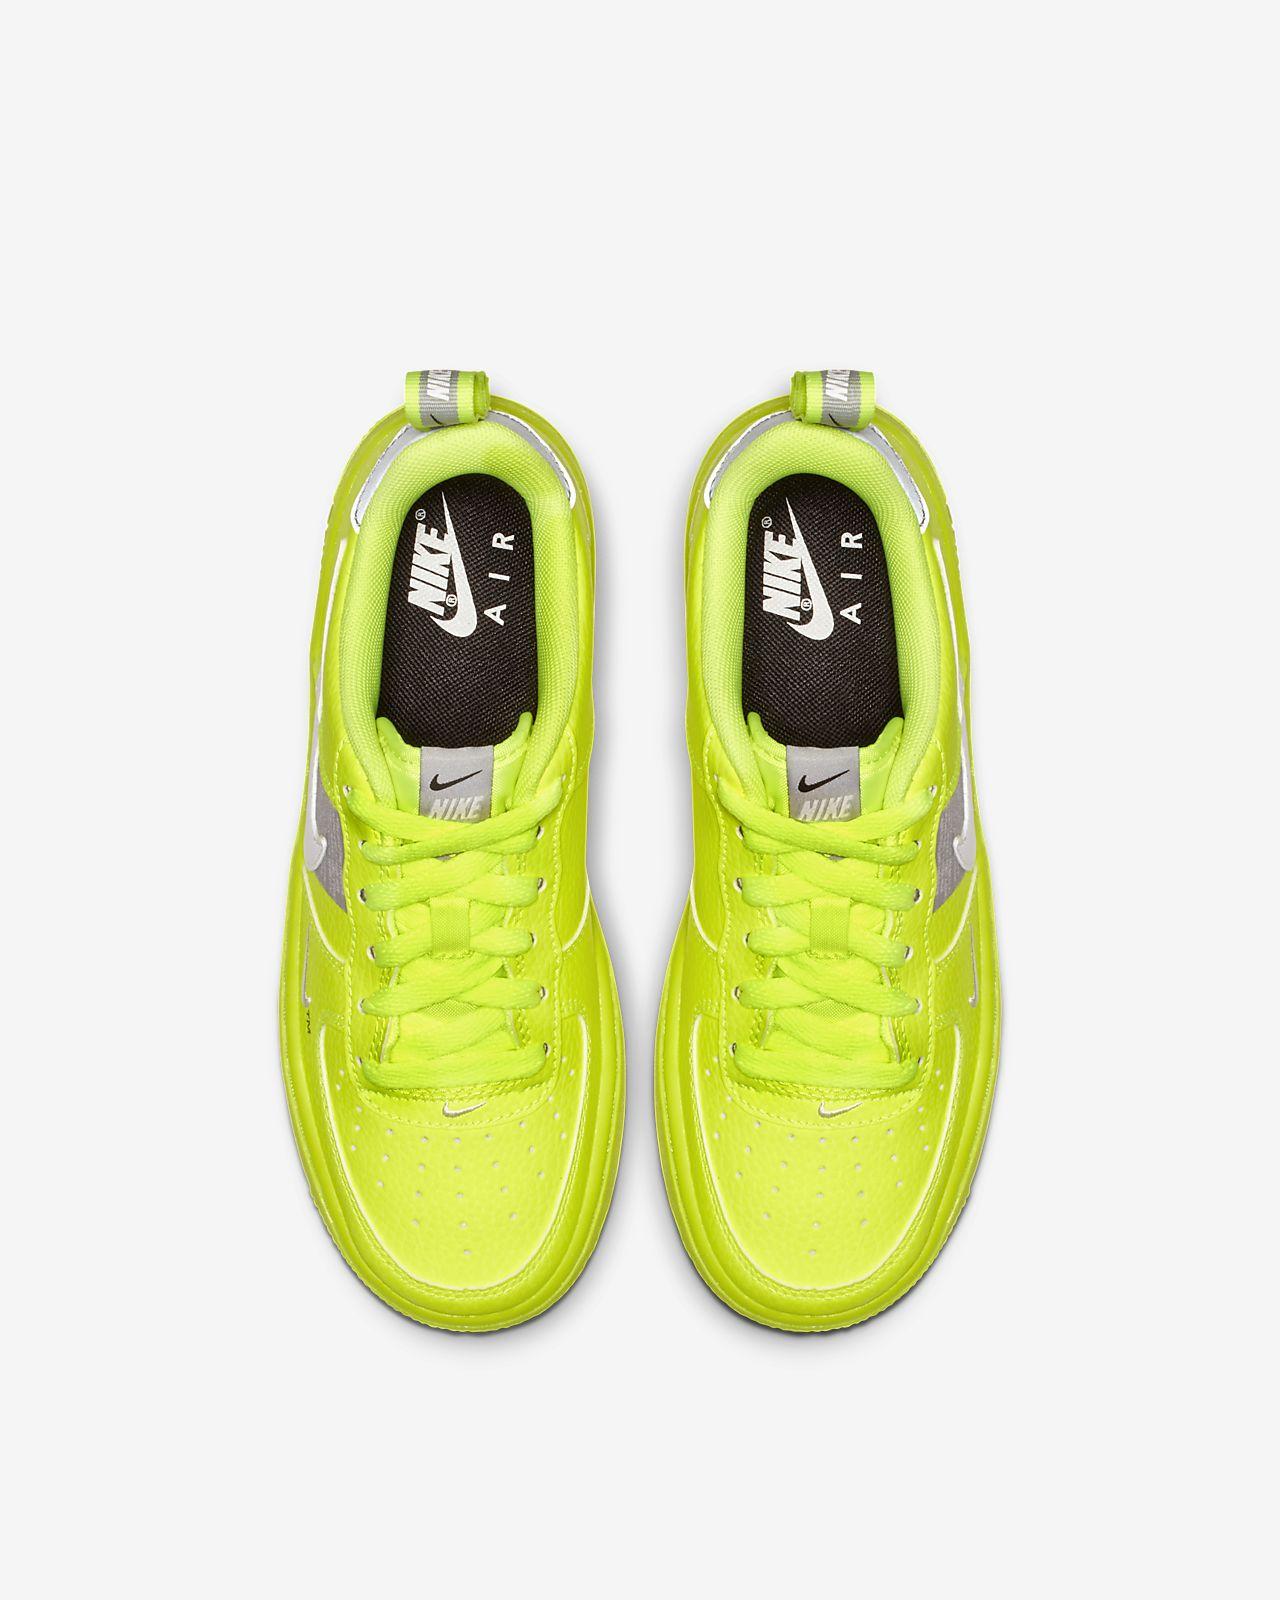 new style 05544 446bd ... Nike Air Force 1 LV8 Utility Big Kids  Shoe